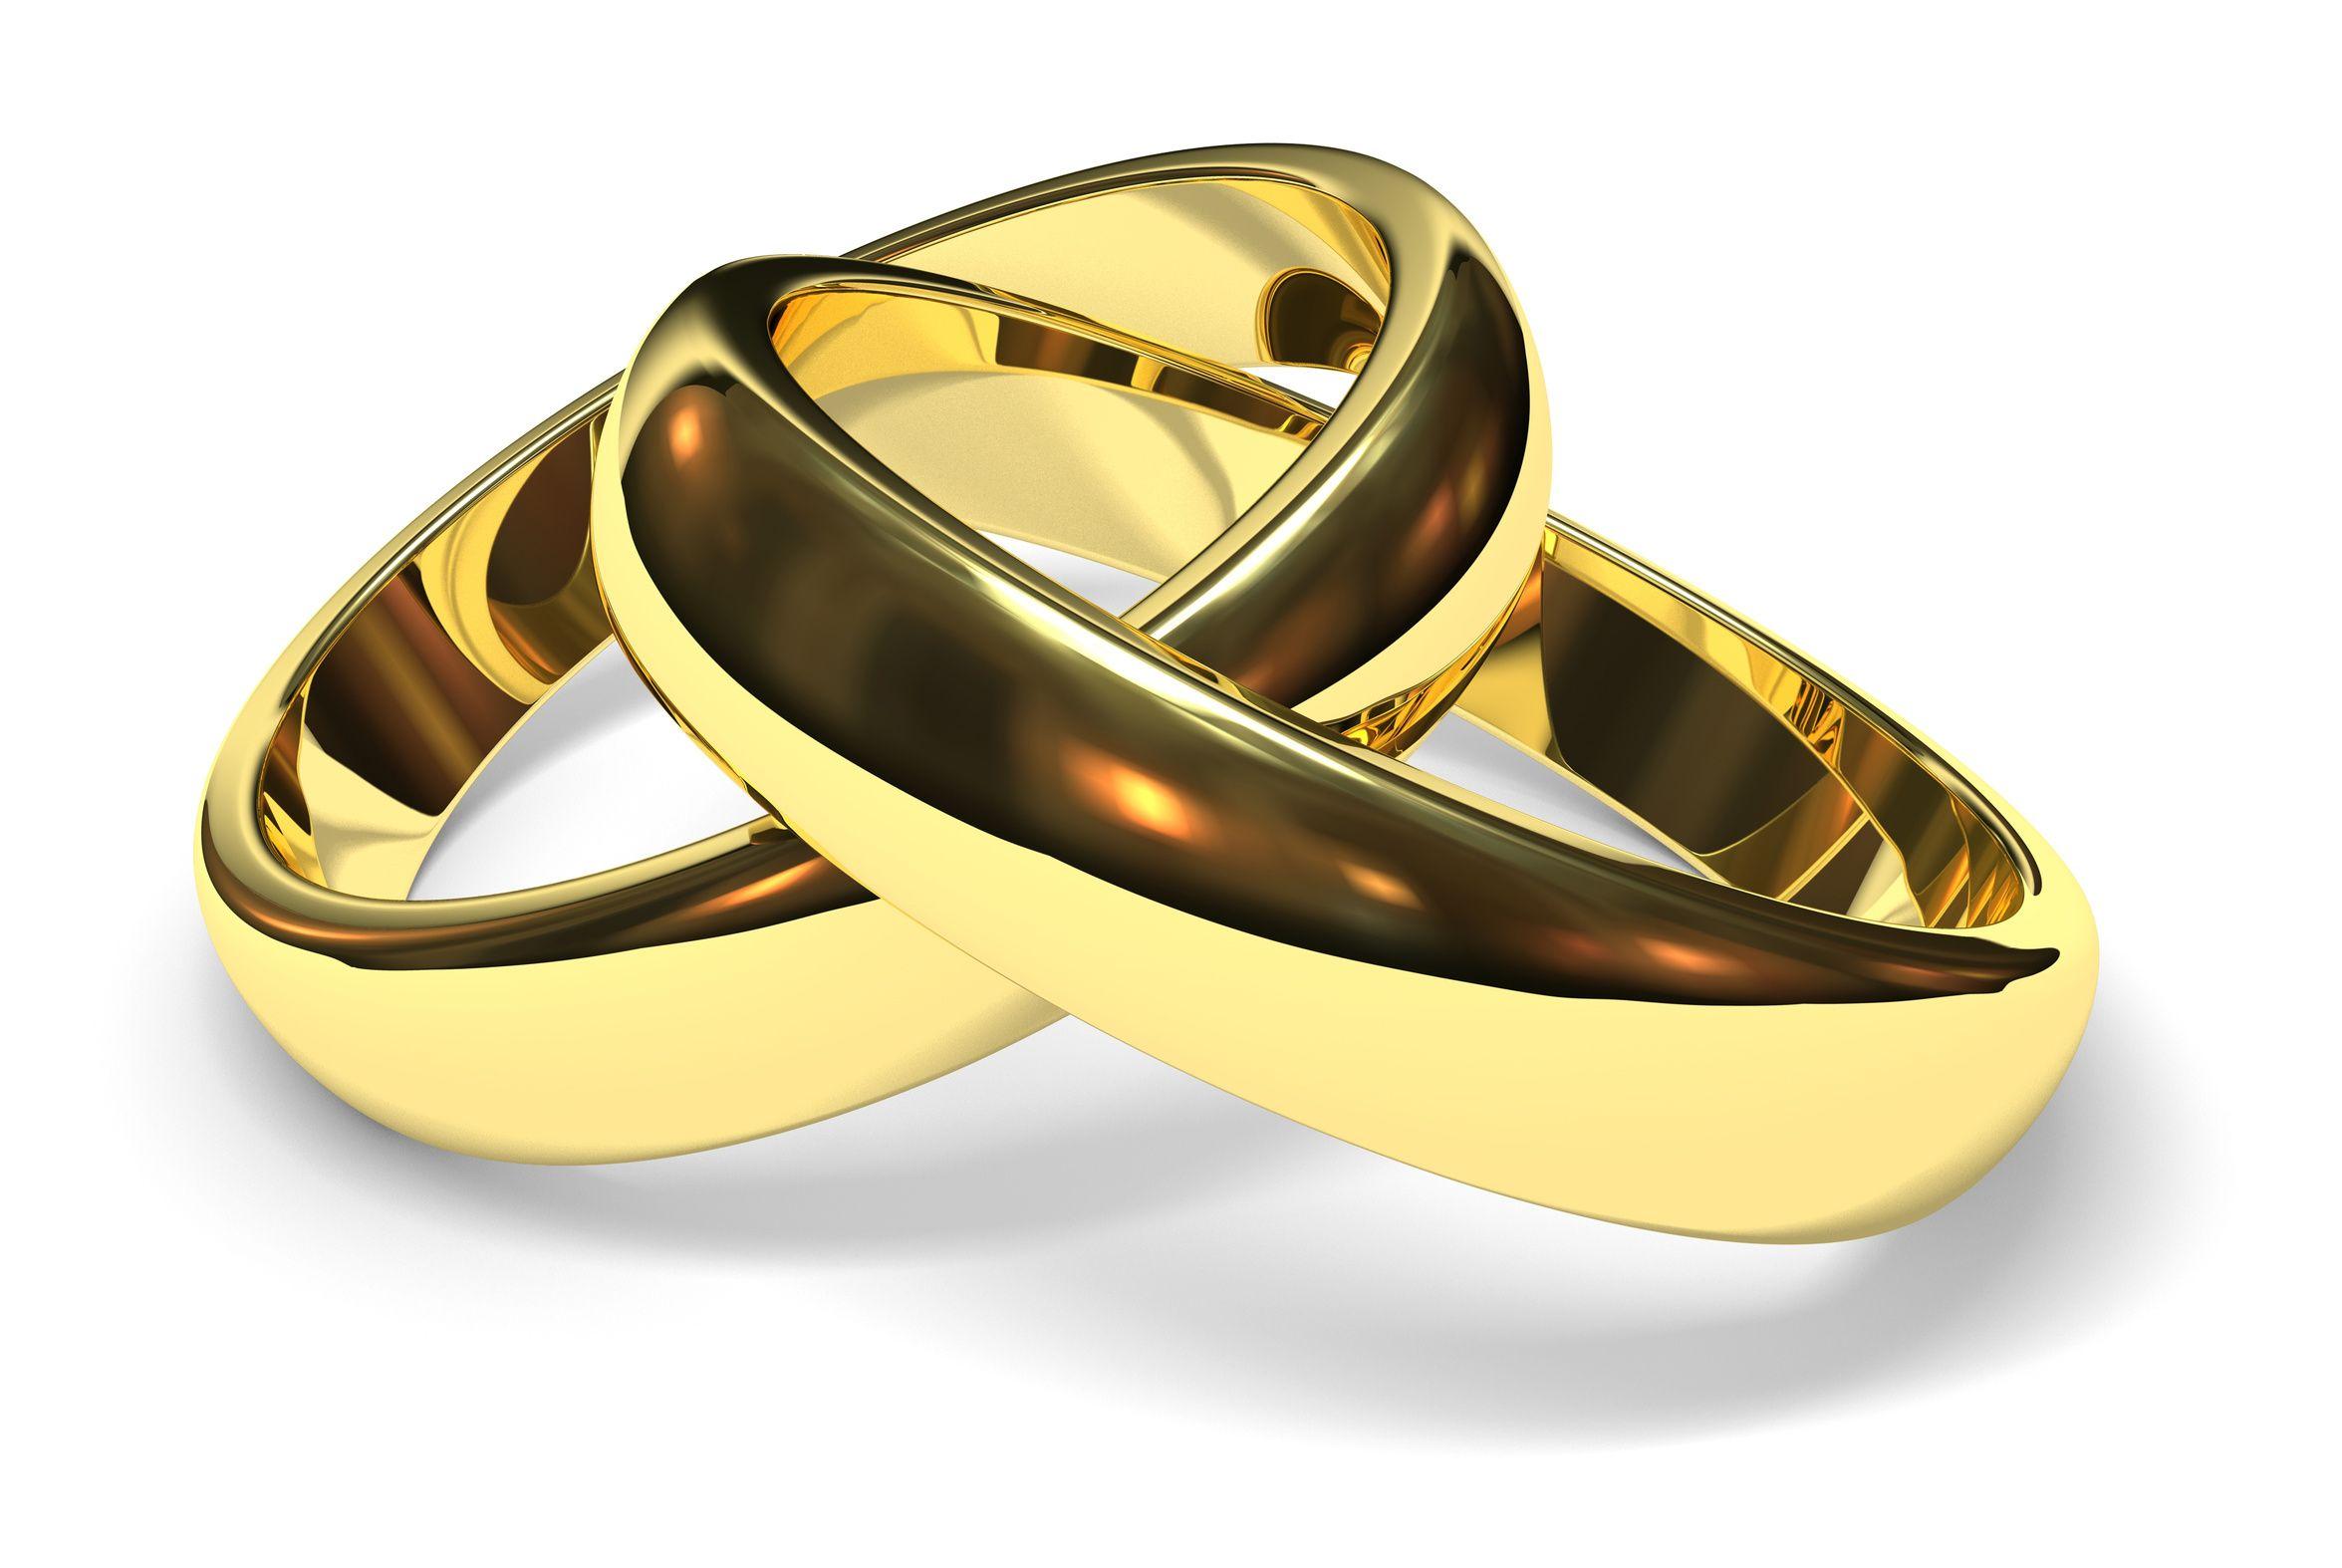 gold wedding rings linked gold wedding rings on white background